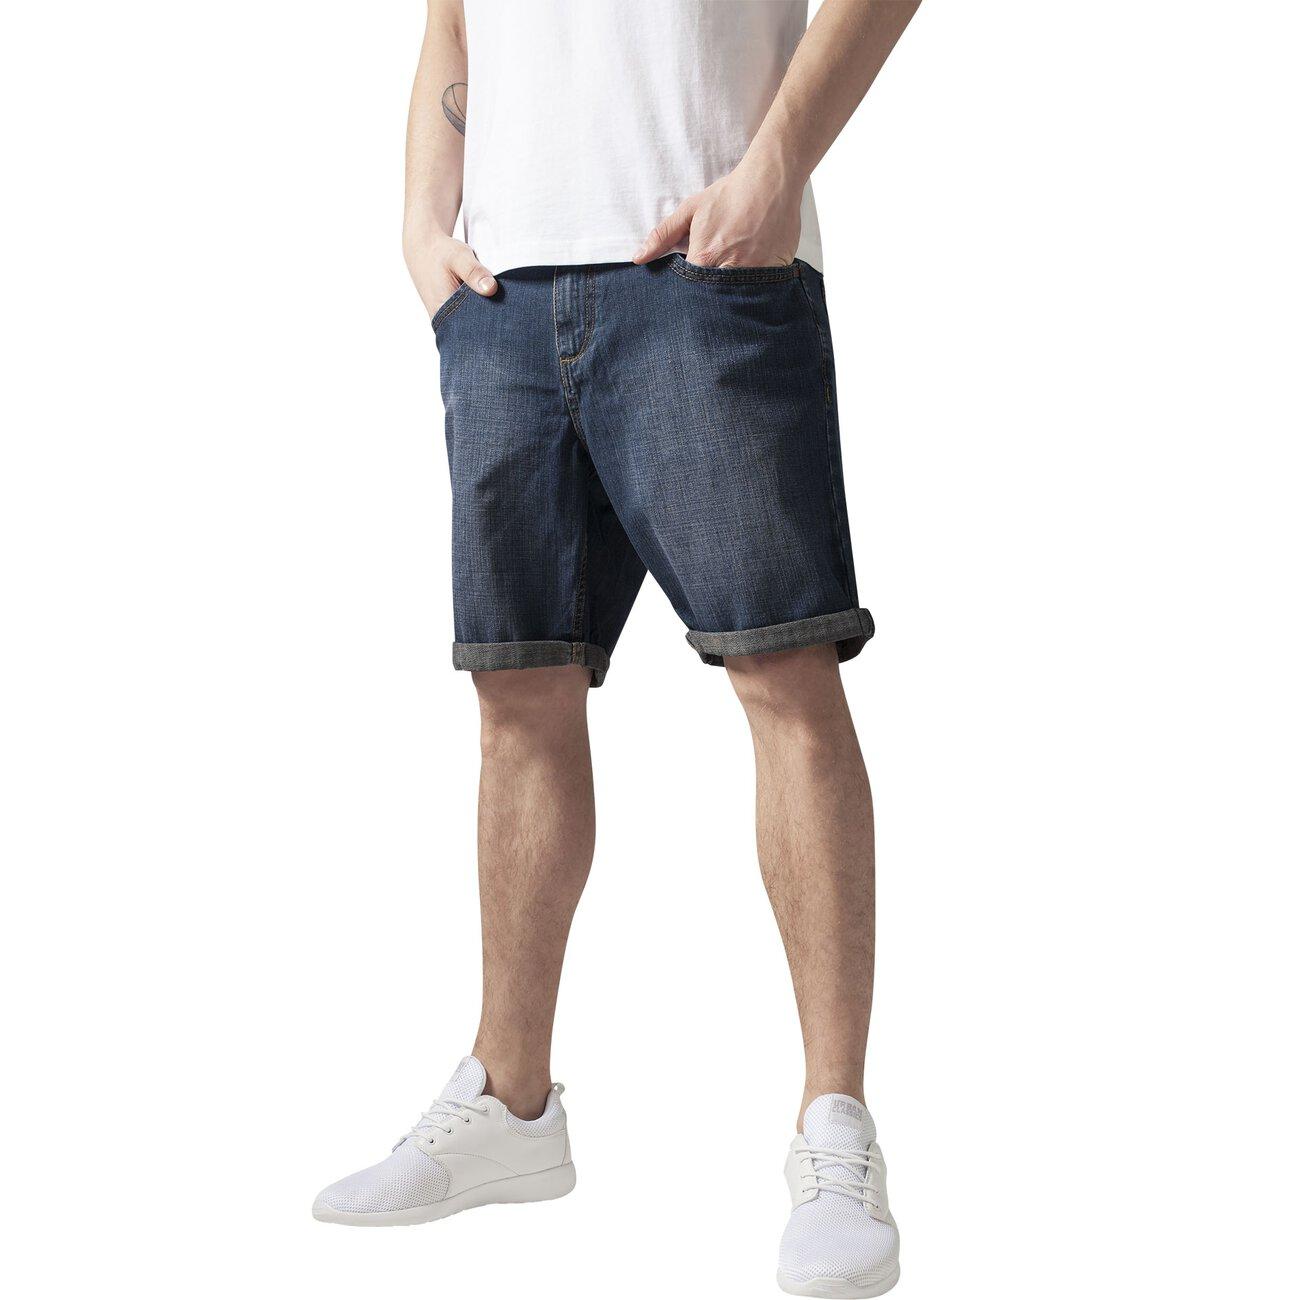 urban classics denim shorts herren fitted denim kurze hose tb 516. Black Bedroom Furniture Sets. Home Design Ideas